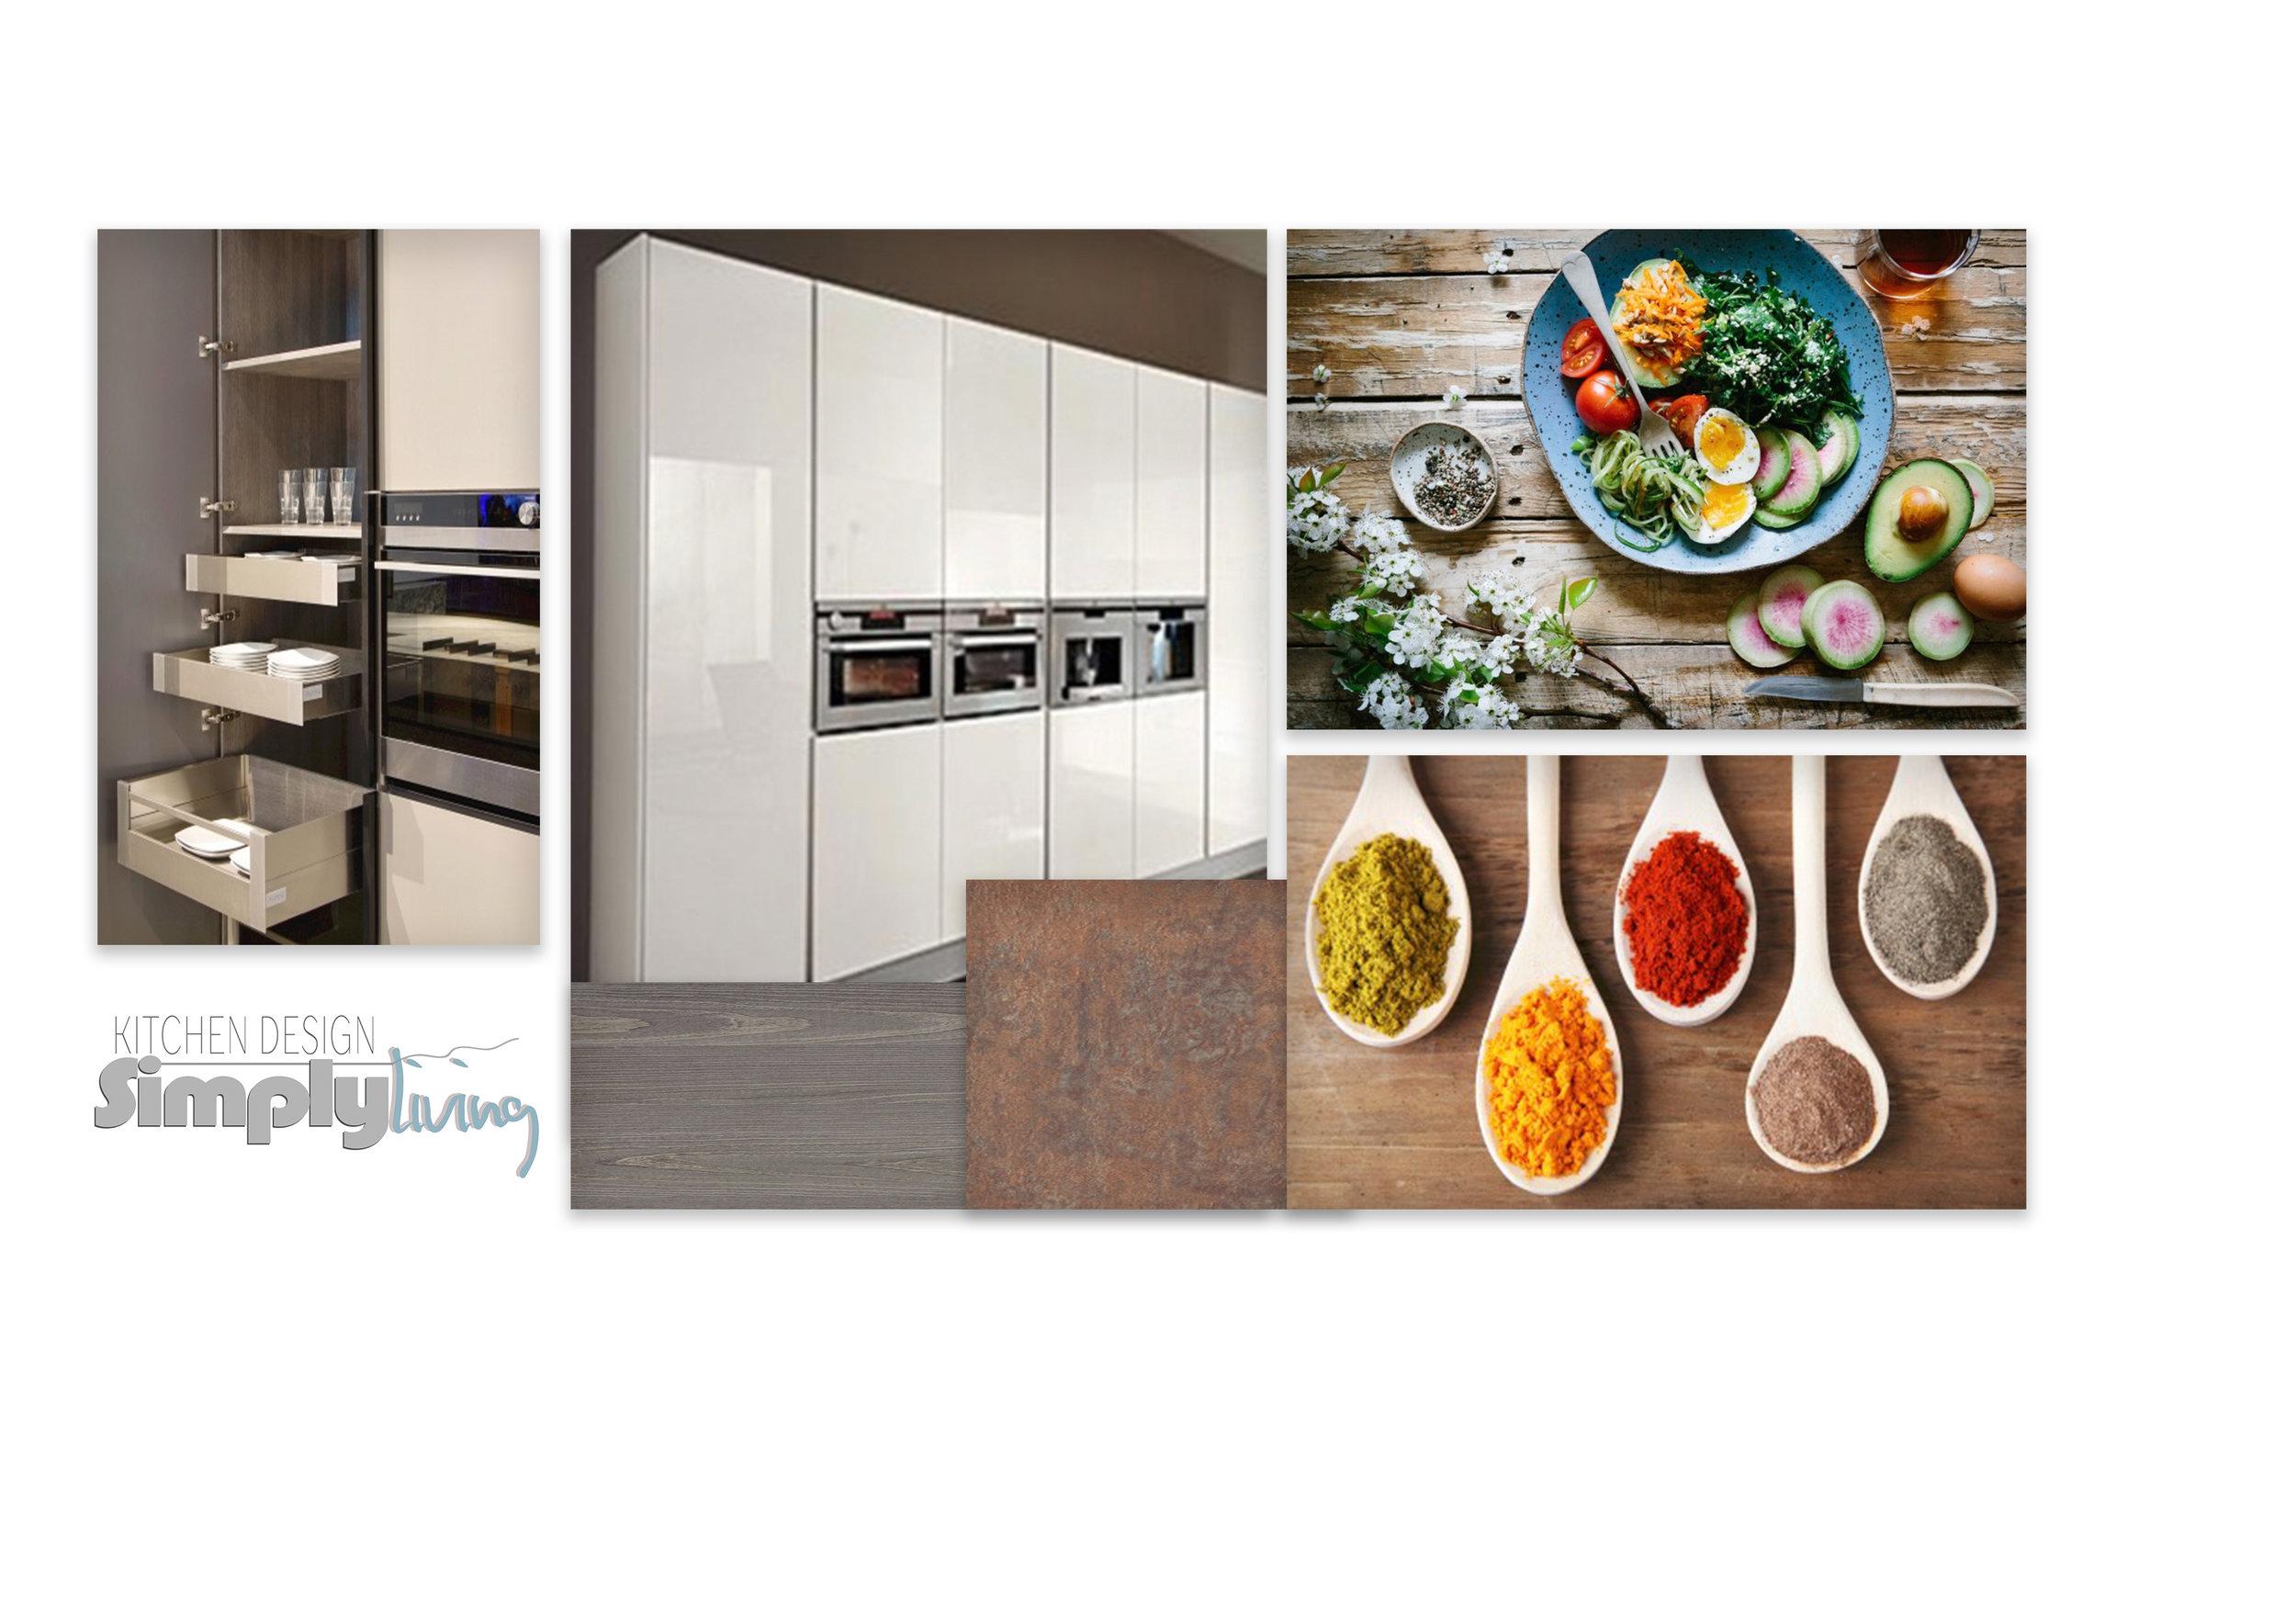 Kitchen Mood 2-1 copy.jpg